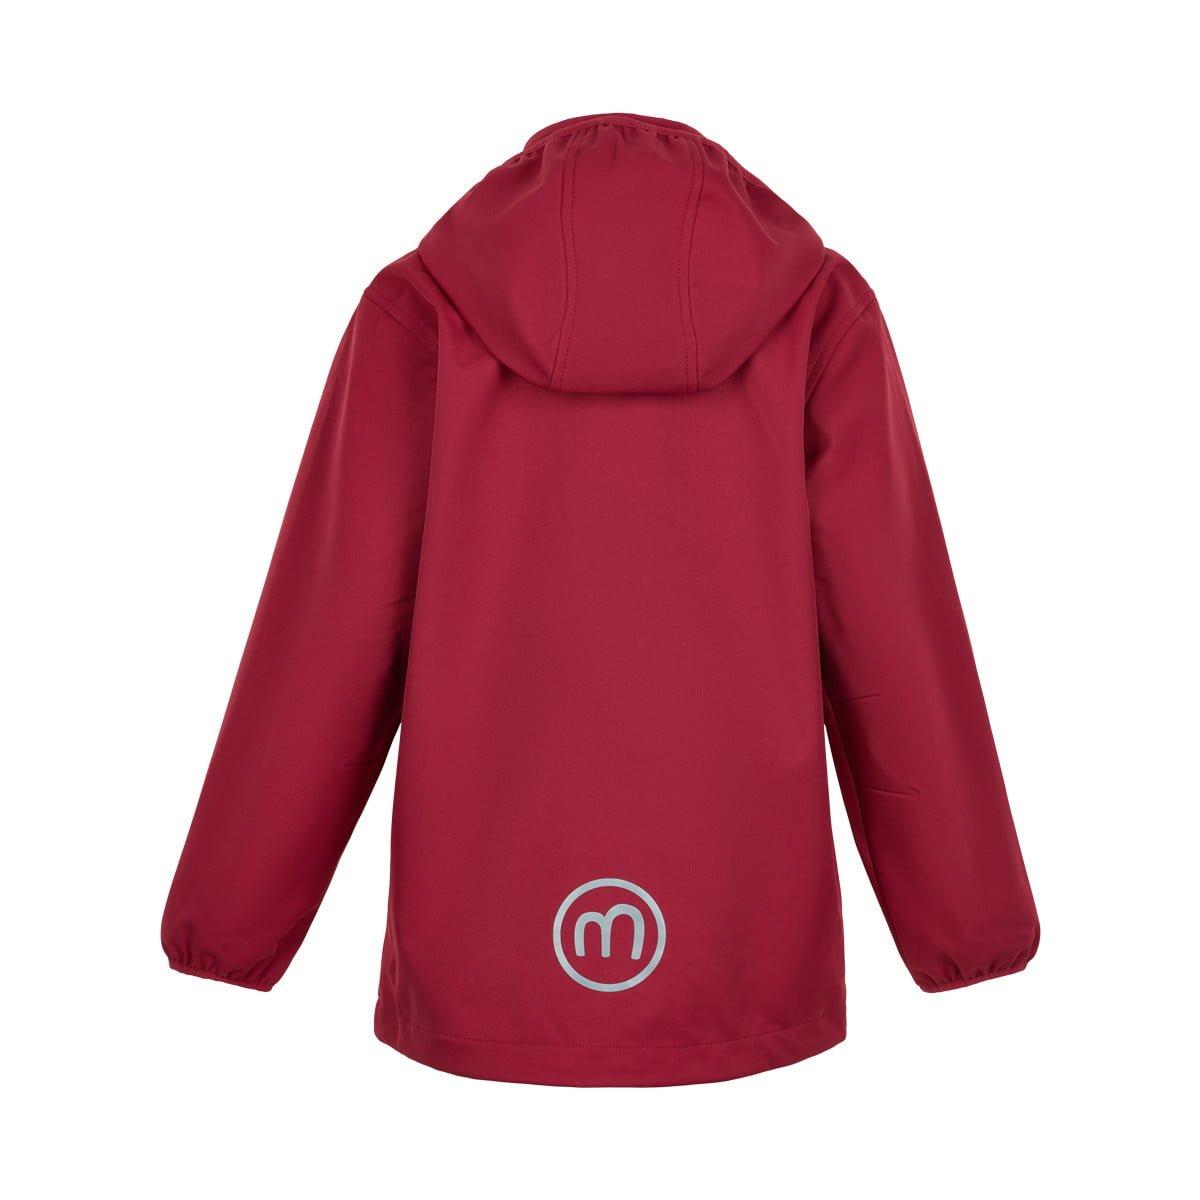 Jachetă de ploaie și vânt (impermeabilă) din softshell Deep Claret Minymo 2